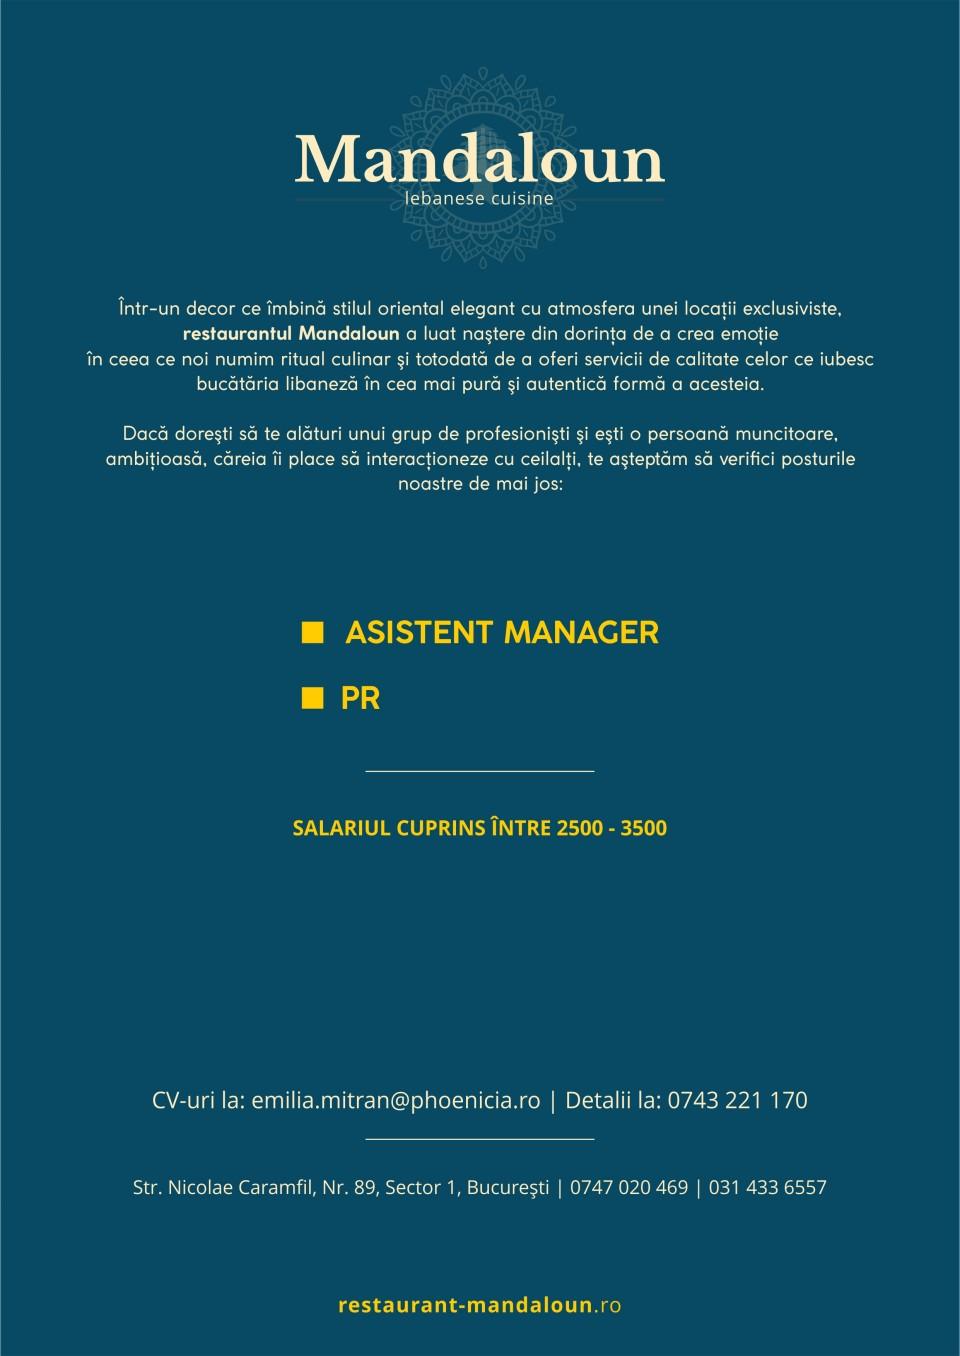 Asistent manager, PR